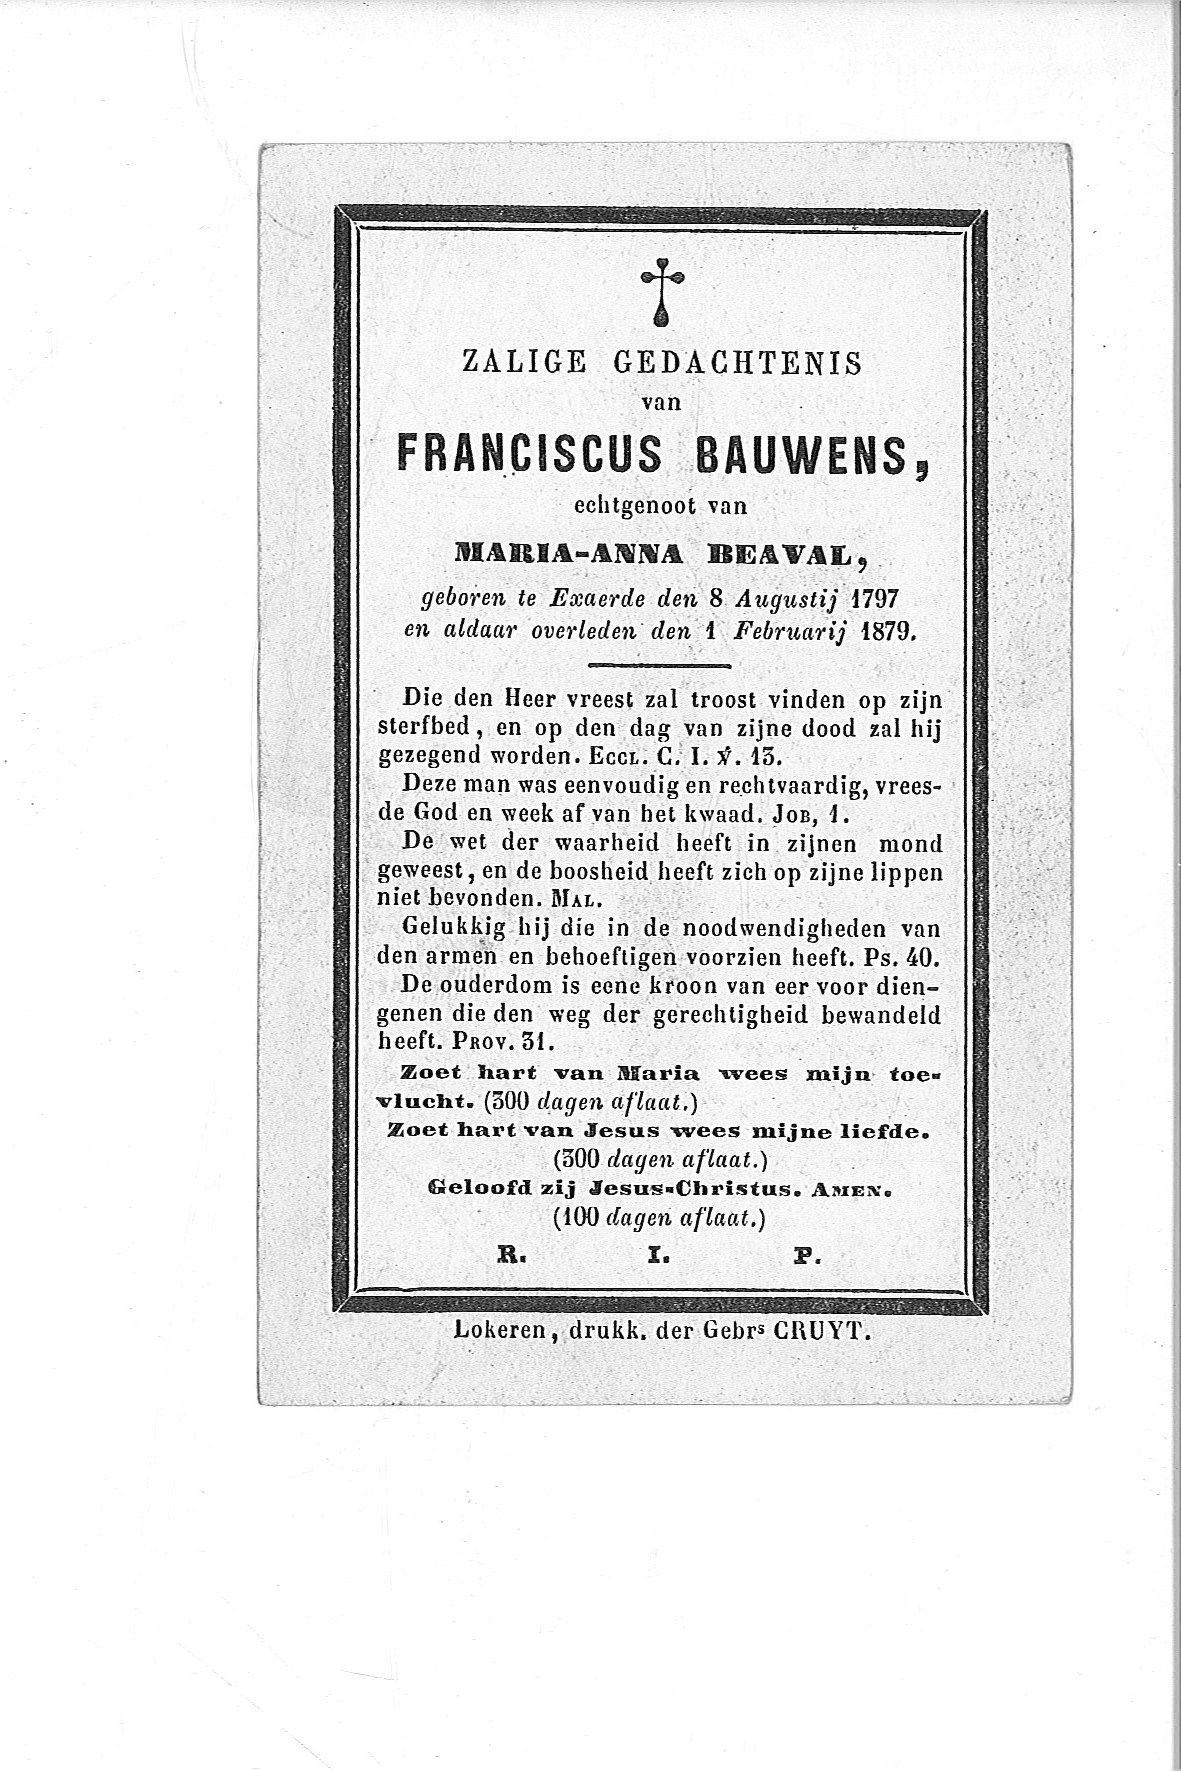 franciscus(1879)20090723104548_00023.jpg